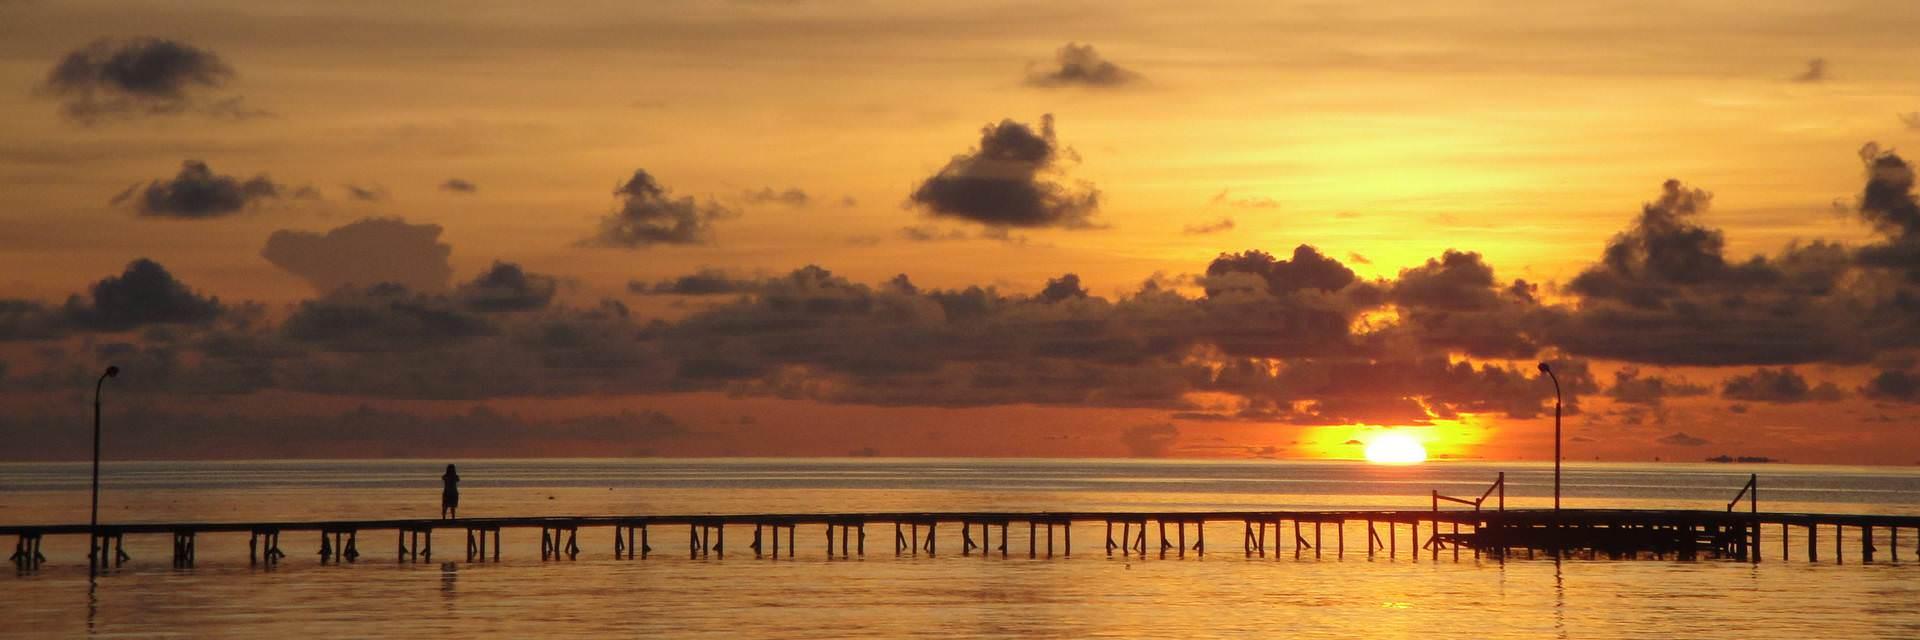 Kepulauan Derawan Dijamin Tak Kalah Indah dengan Raja Ampat Kepulauan Derawan Dijamin Tak Kalah Indah dengan Raja Ampat - Dolan Dolen